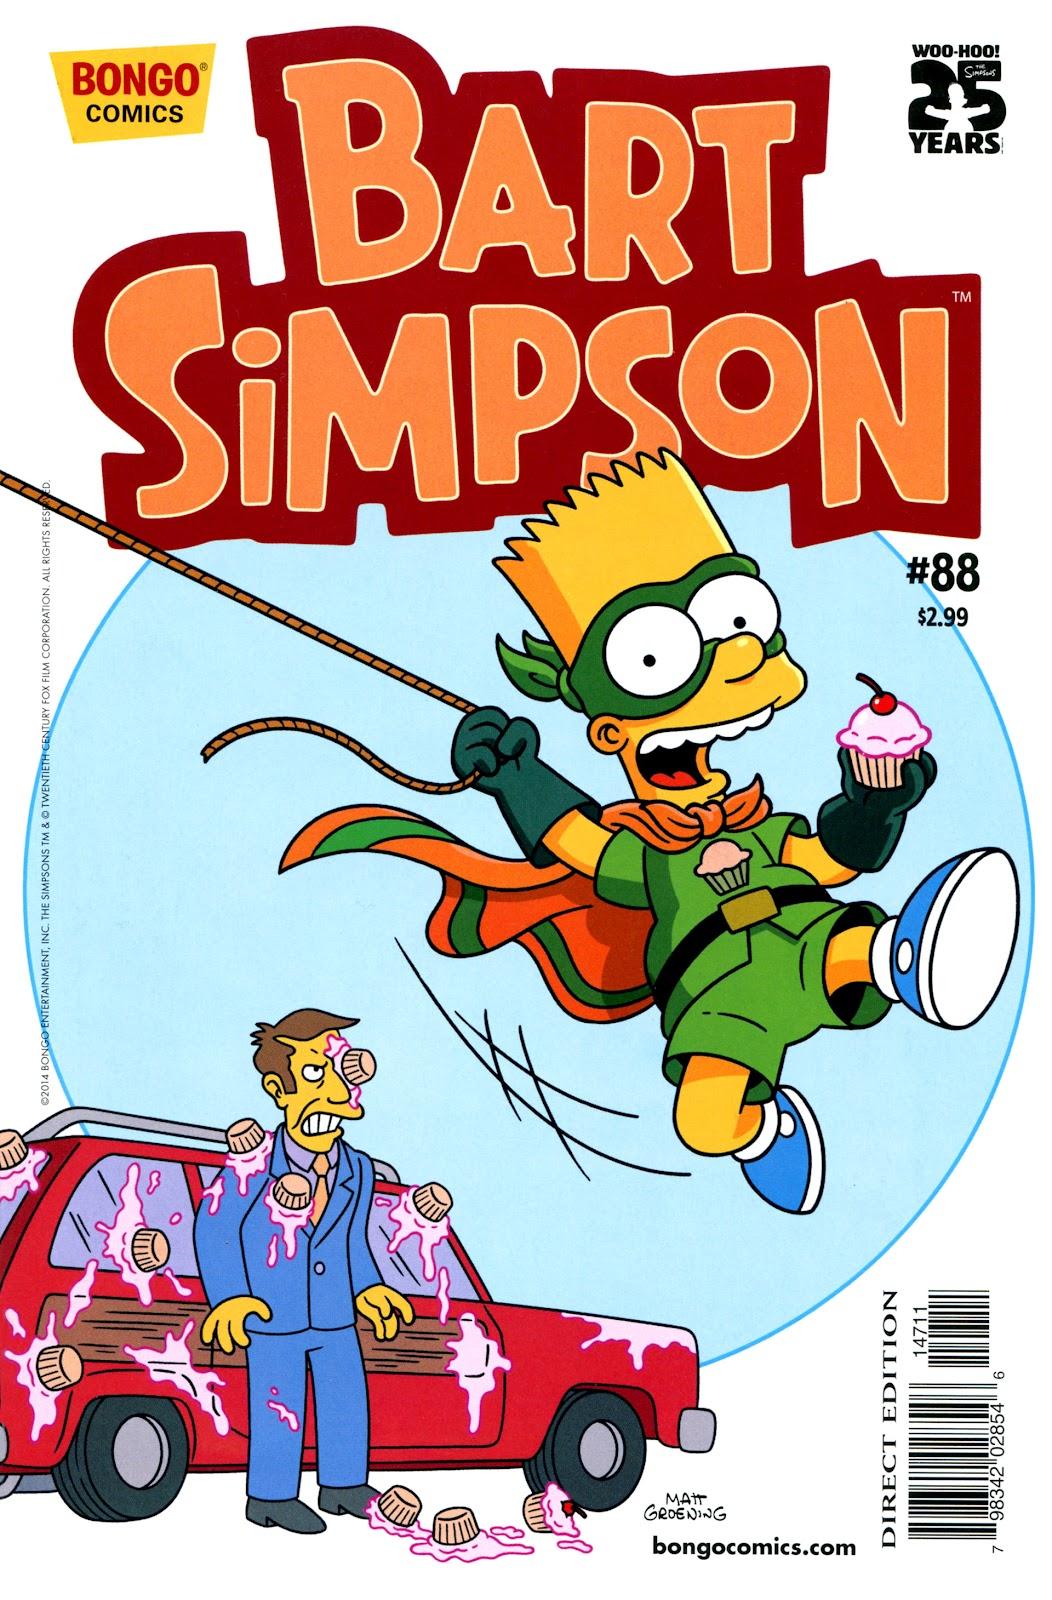 Simpsons Comics Presents Bart Simpson 88 Page 1